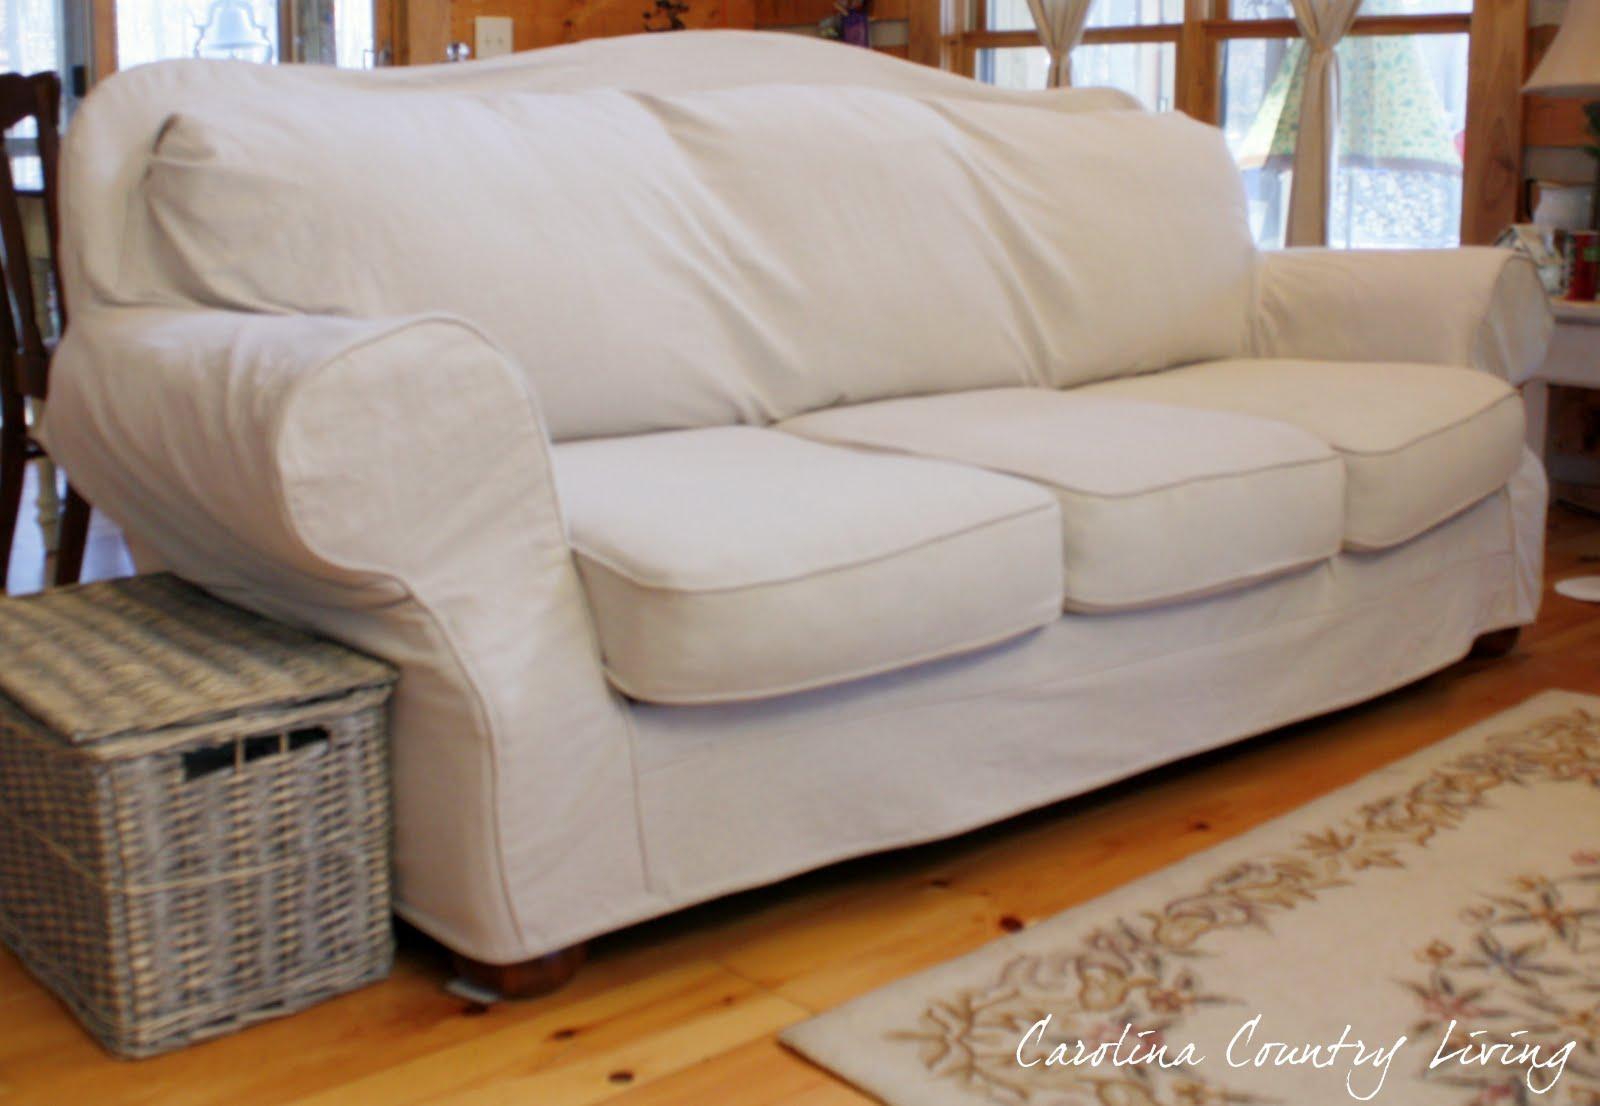 Sofas Center : Cushion Sofa Slipcovers T Style Camel Back Regarding Camelback Slipcovers (View 6 of 20)